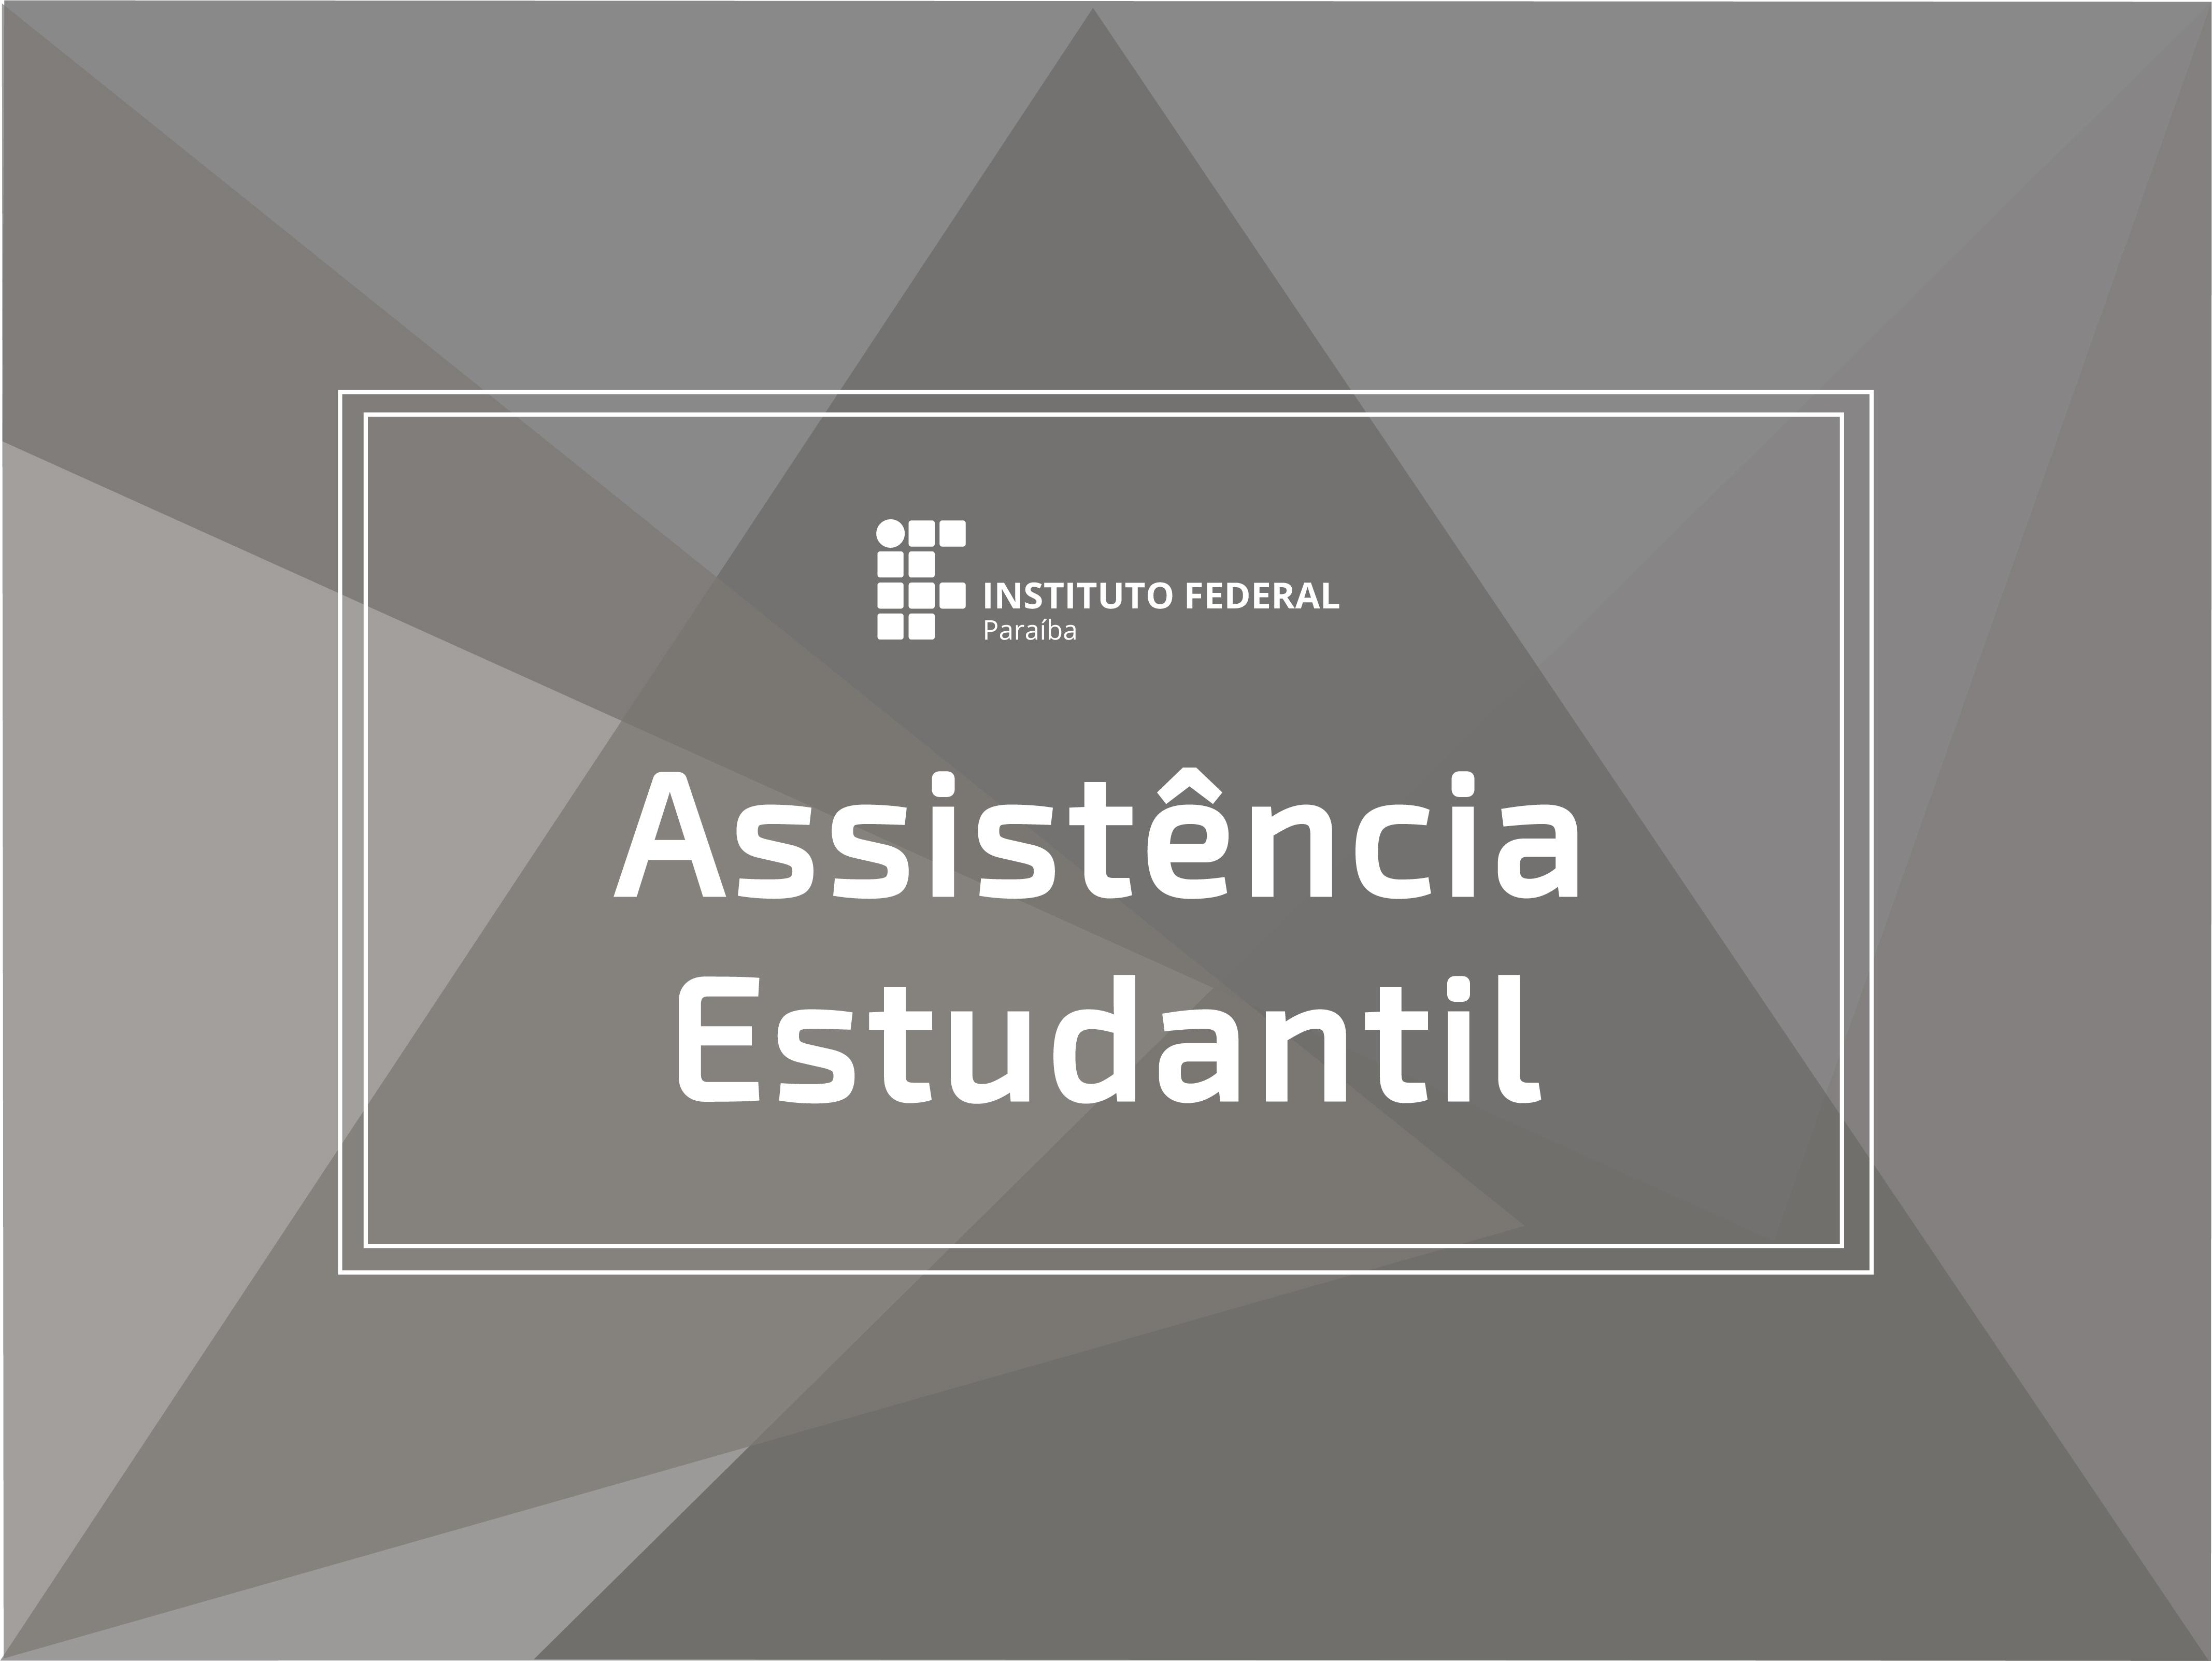 ASSISTÊNCIA ESTUDANTIL.jpg